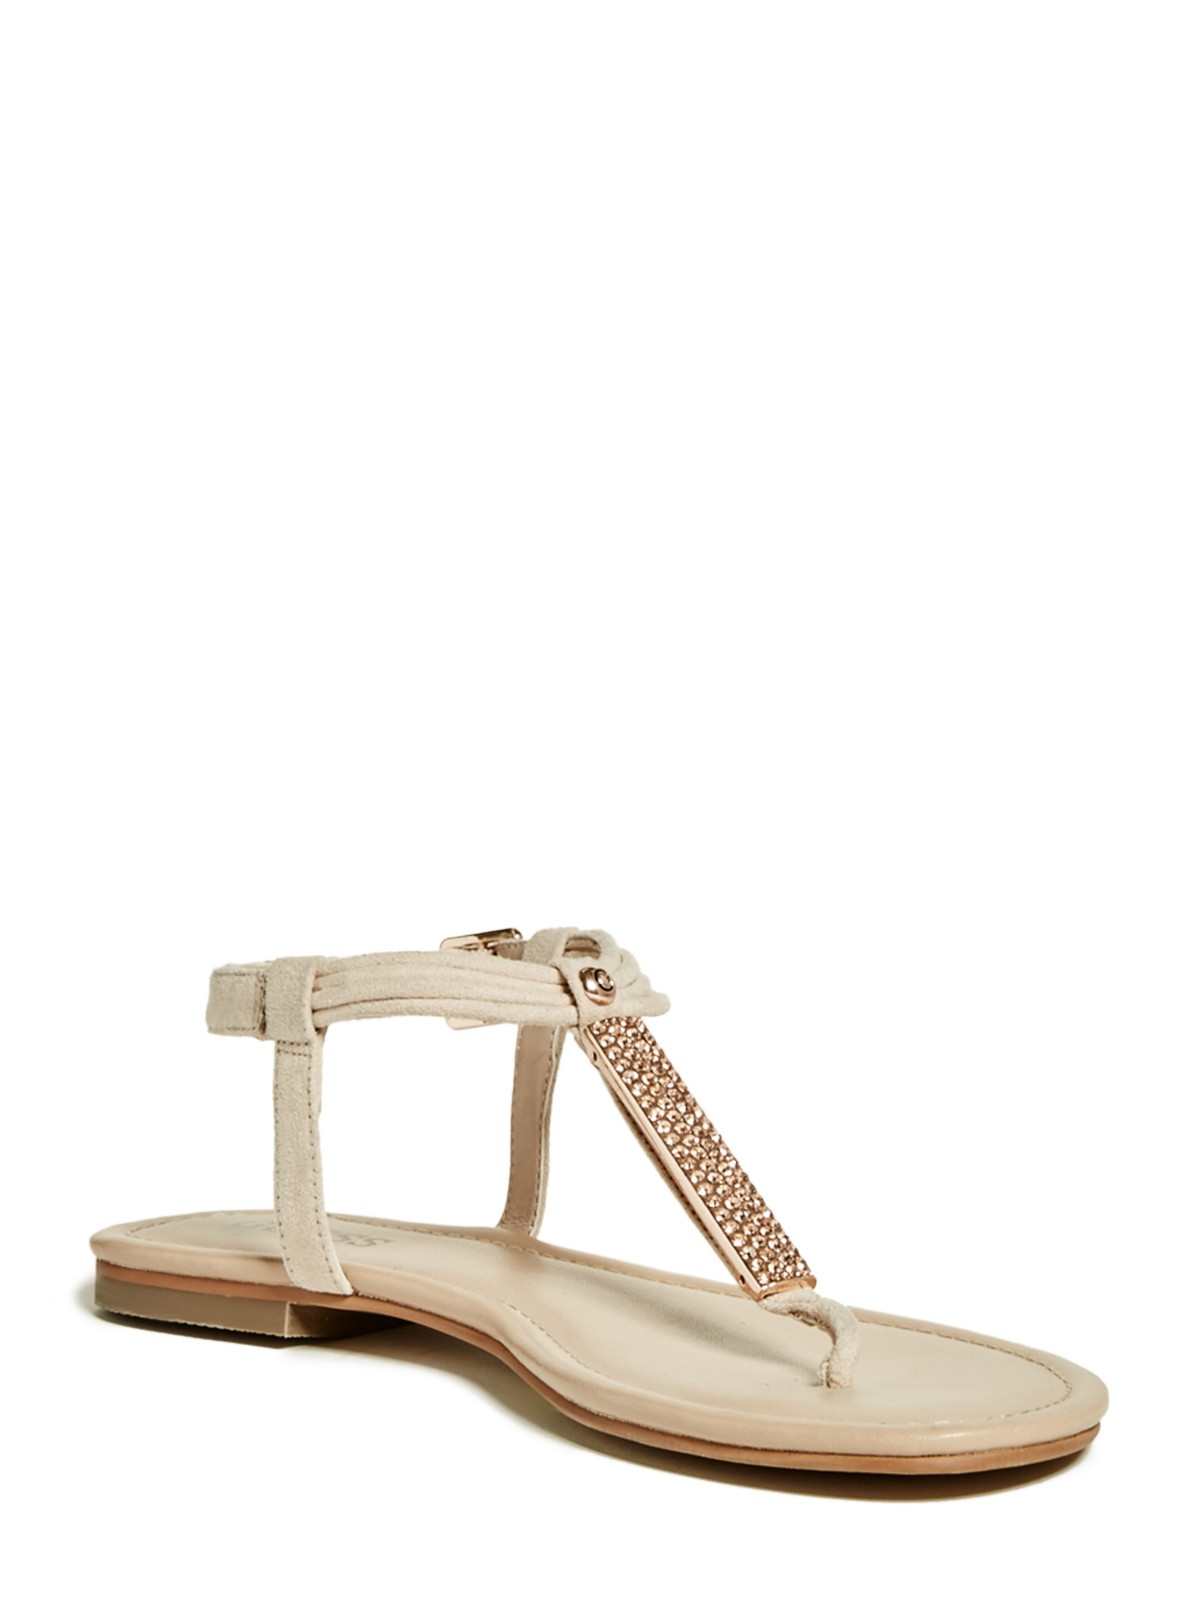 Model GUESS G By Guess Women39s Lei TStrap Flat Thong Sandals Women39s Shoes